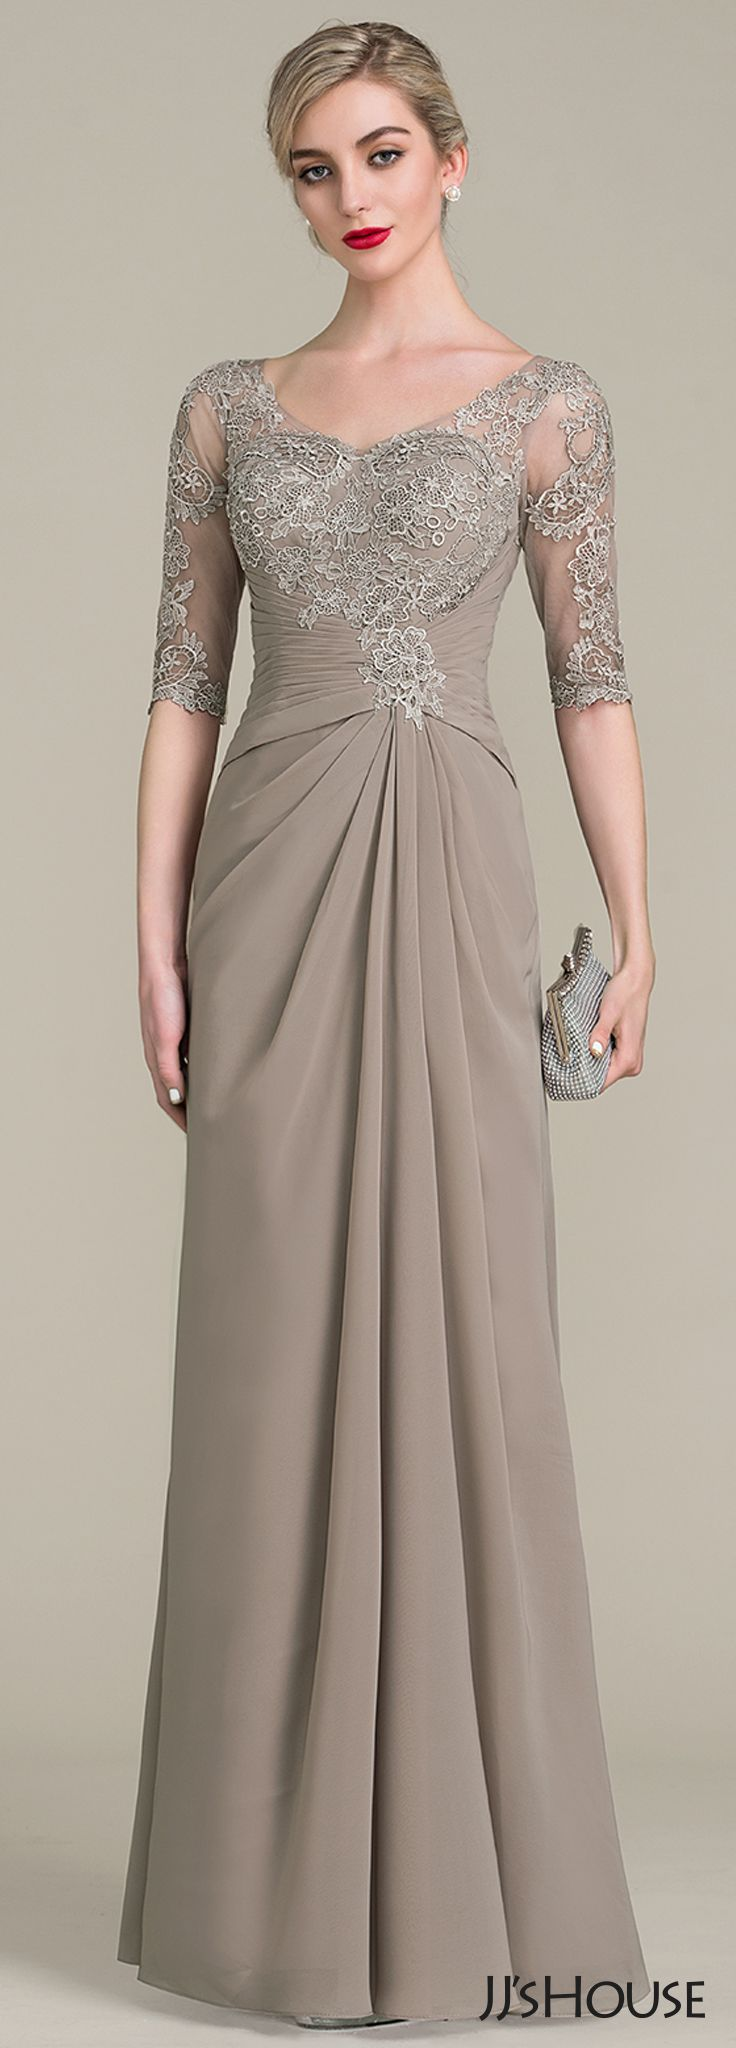 best feshion eveningcocktail dresses images on pinterest